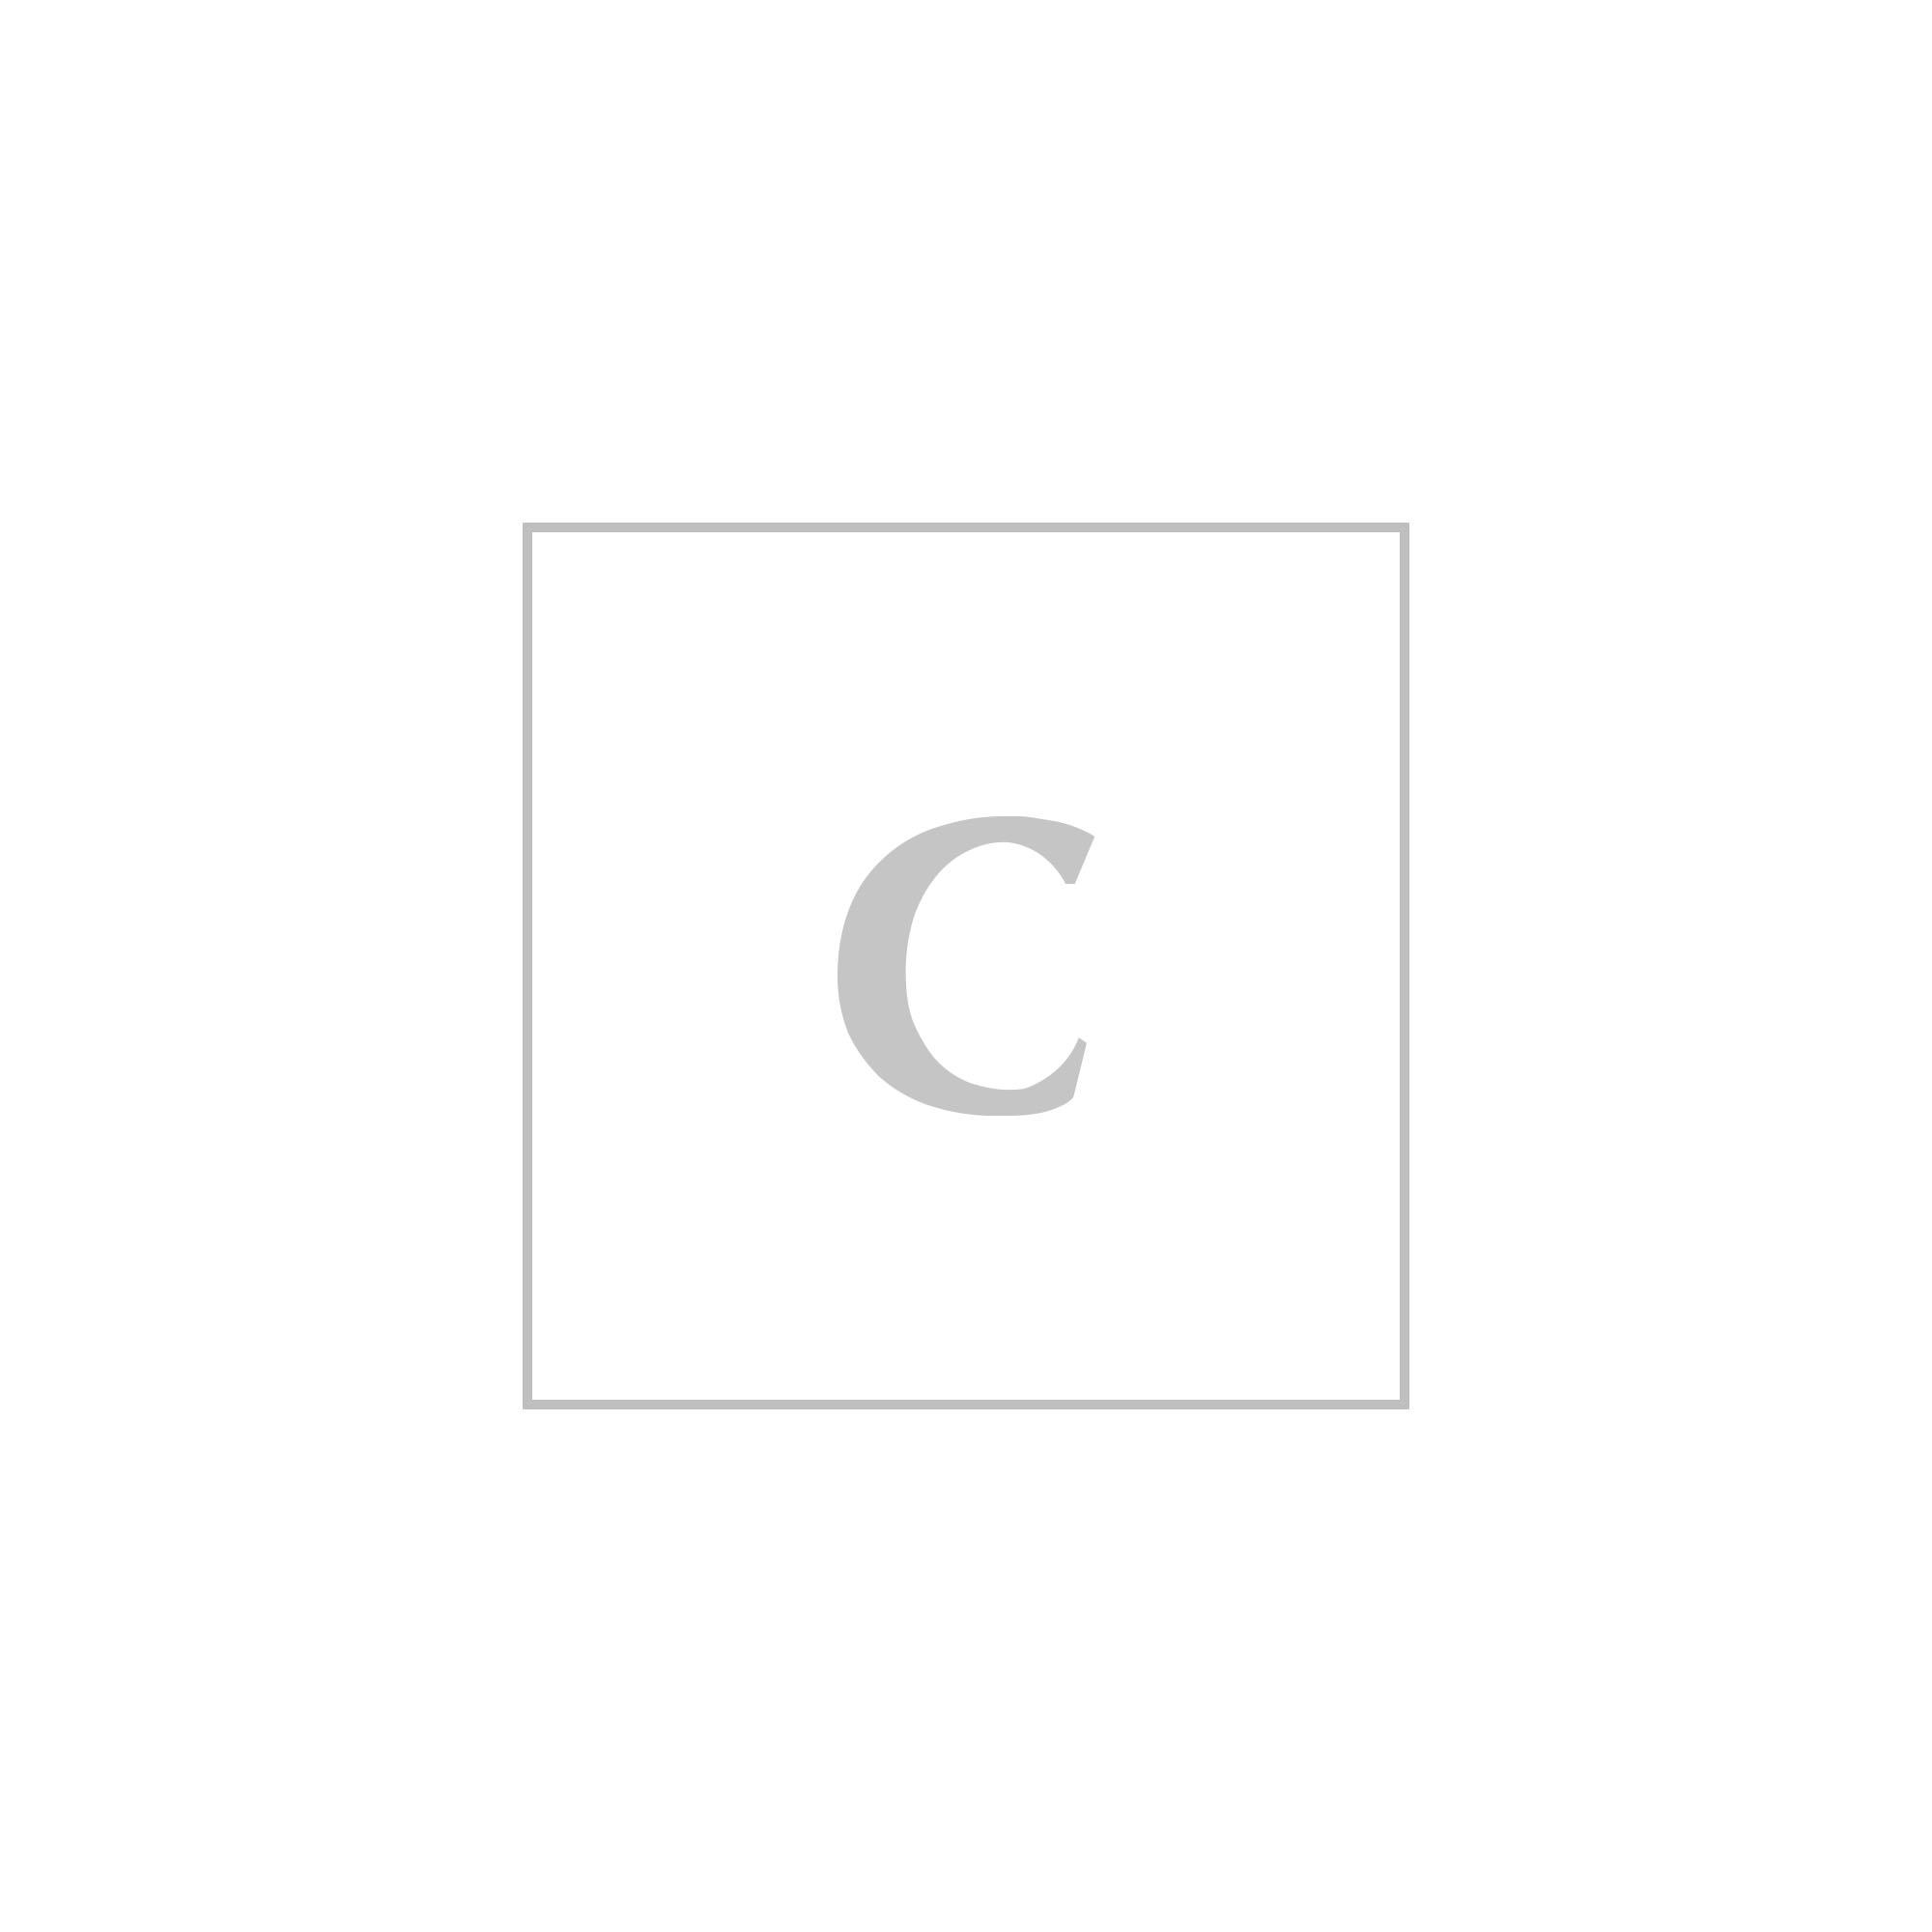 10ae3315a8 Calvin klein established 1978 modernist shorts